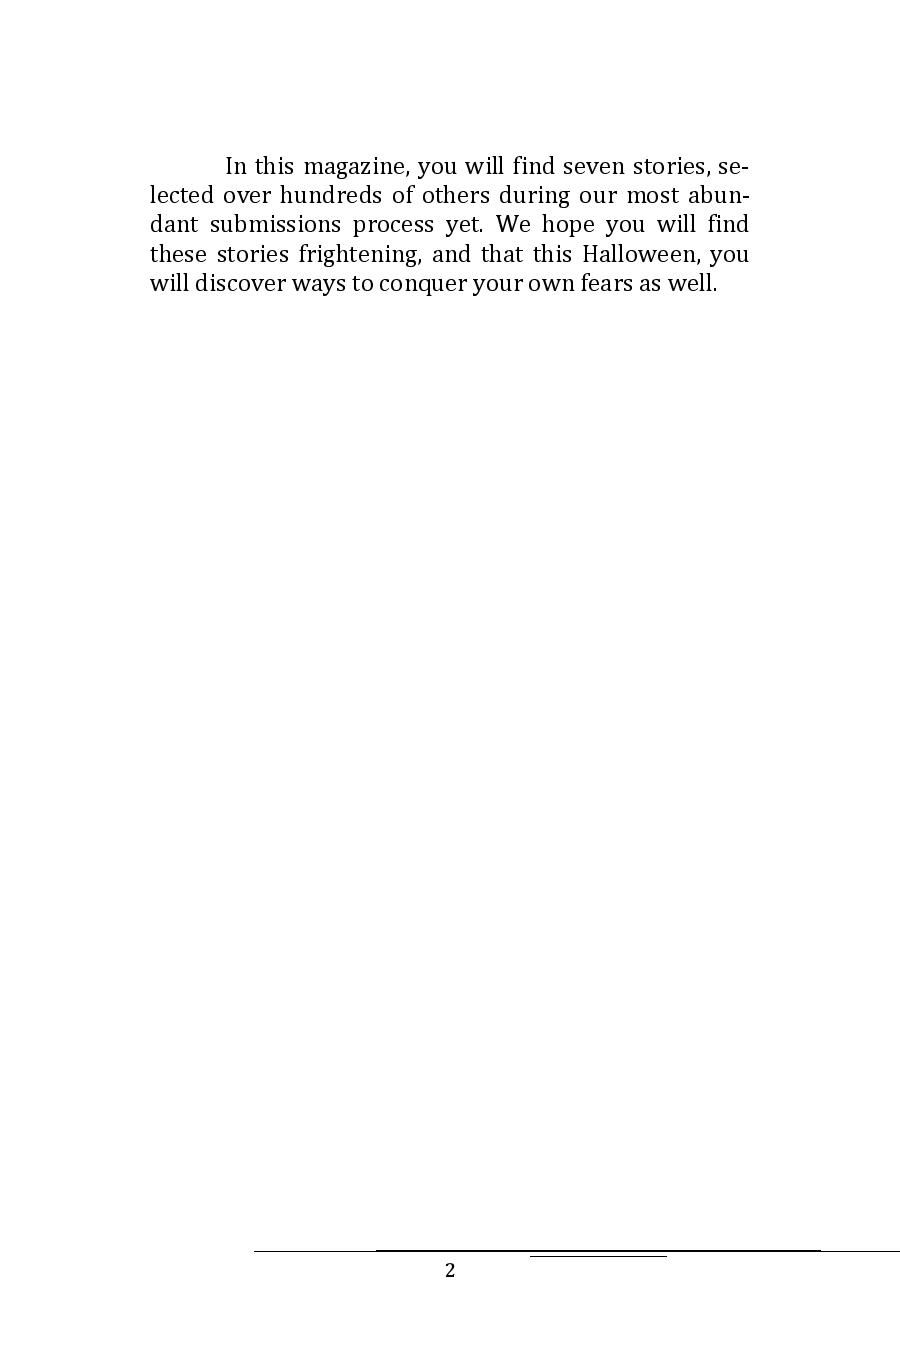 Hinnom Magazine 003 Manuscript Print-page-006